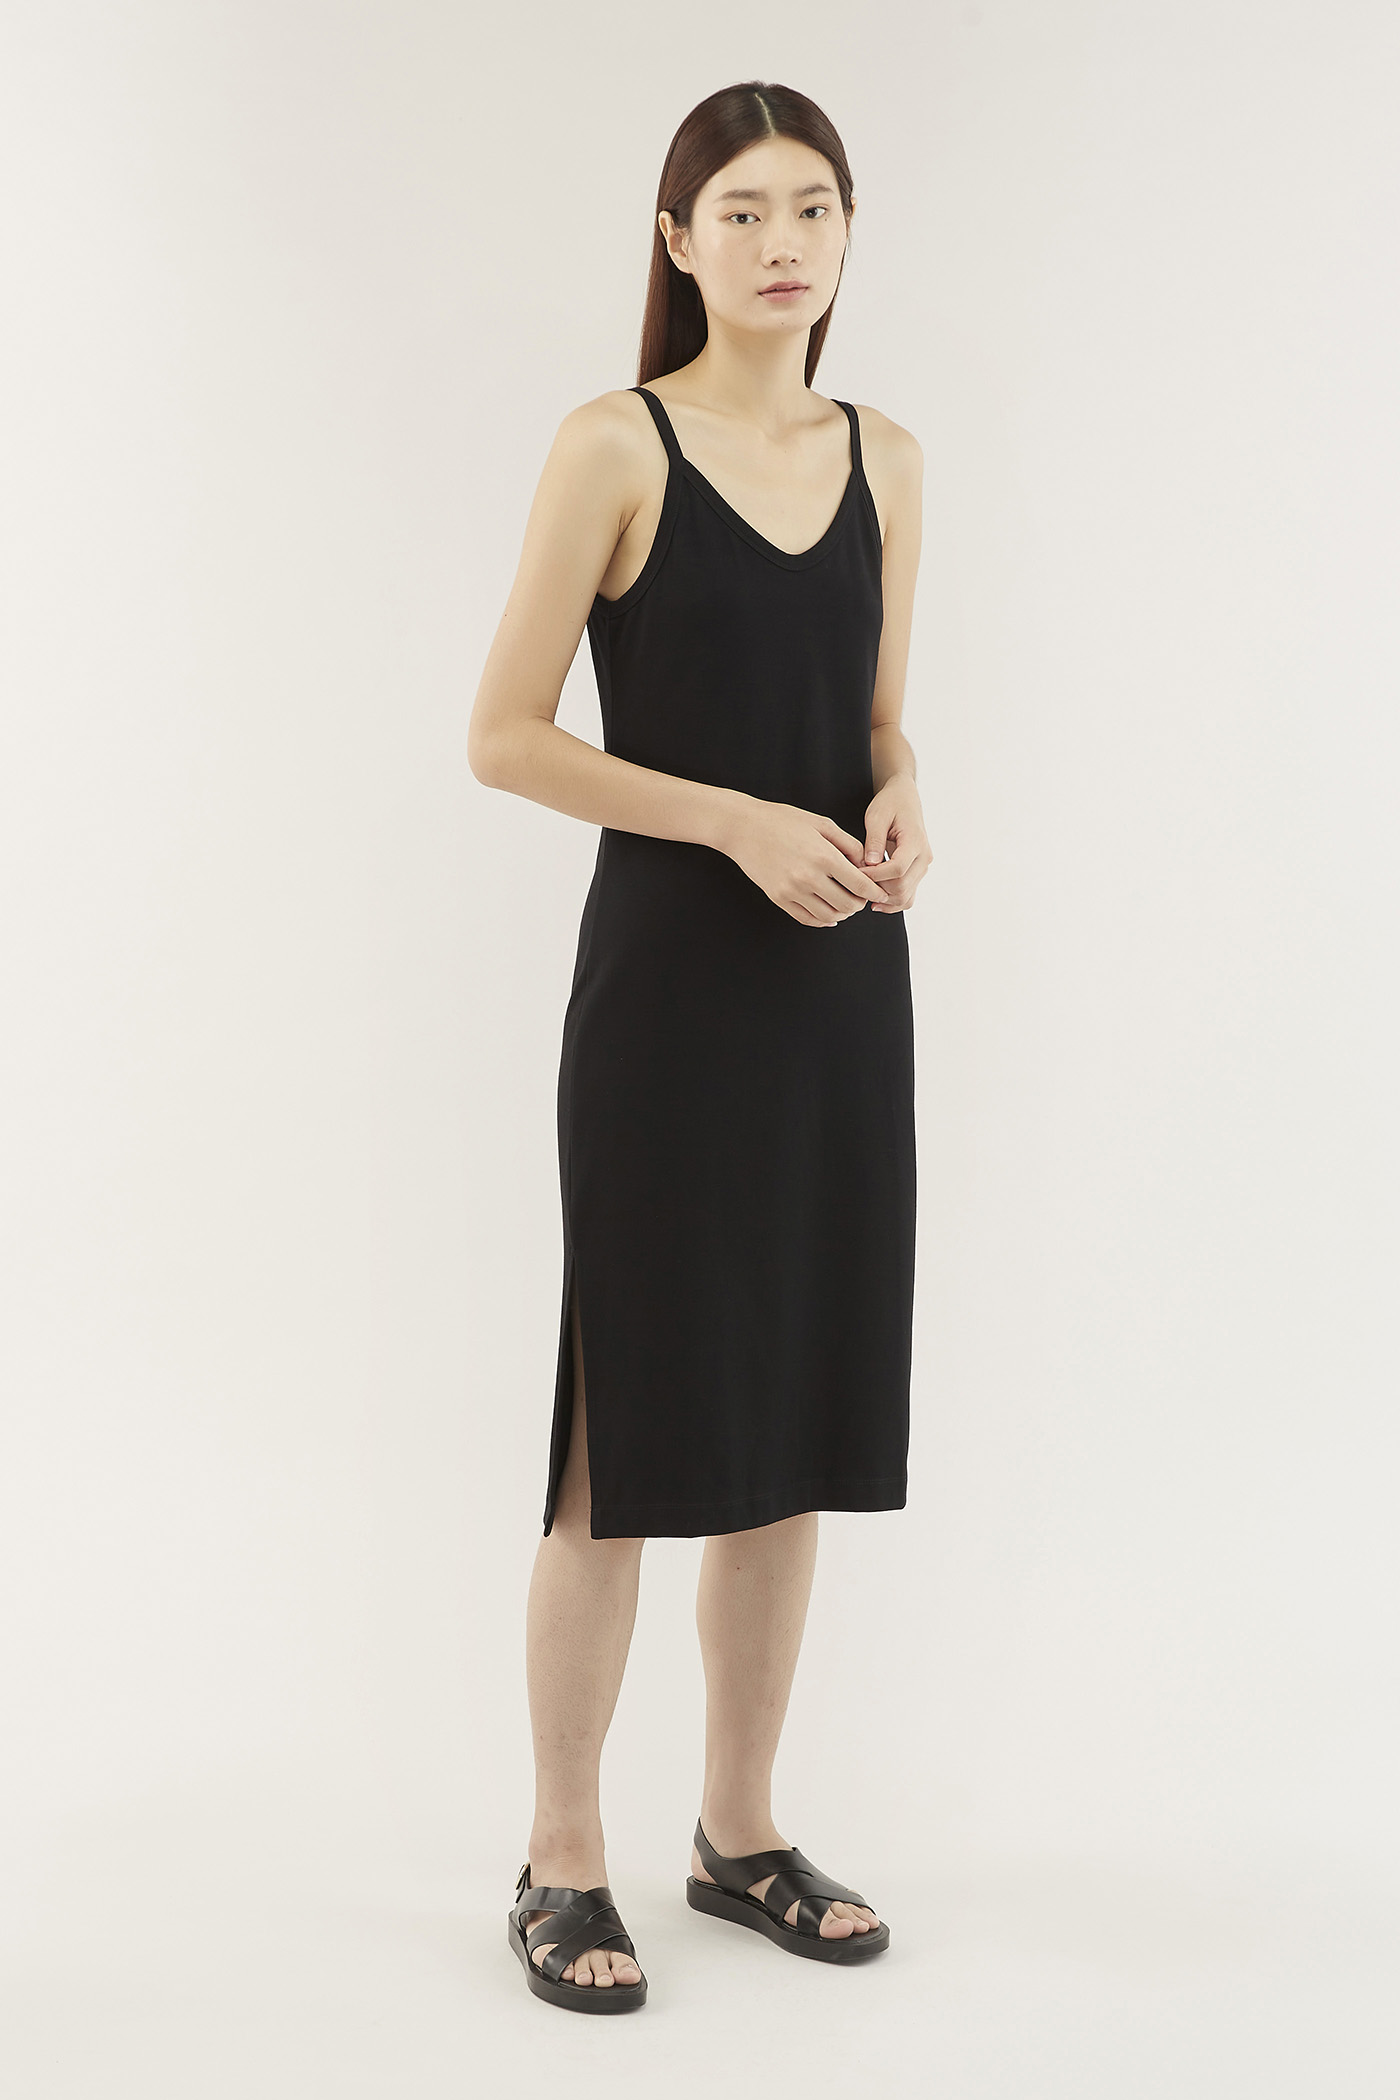 Alecia V-neck Tank Dress